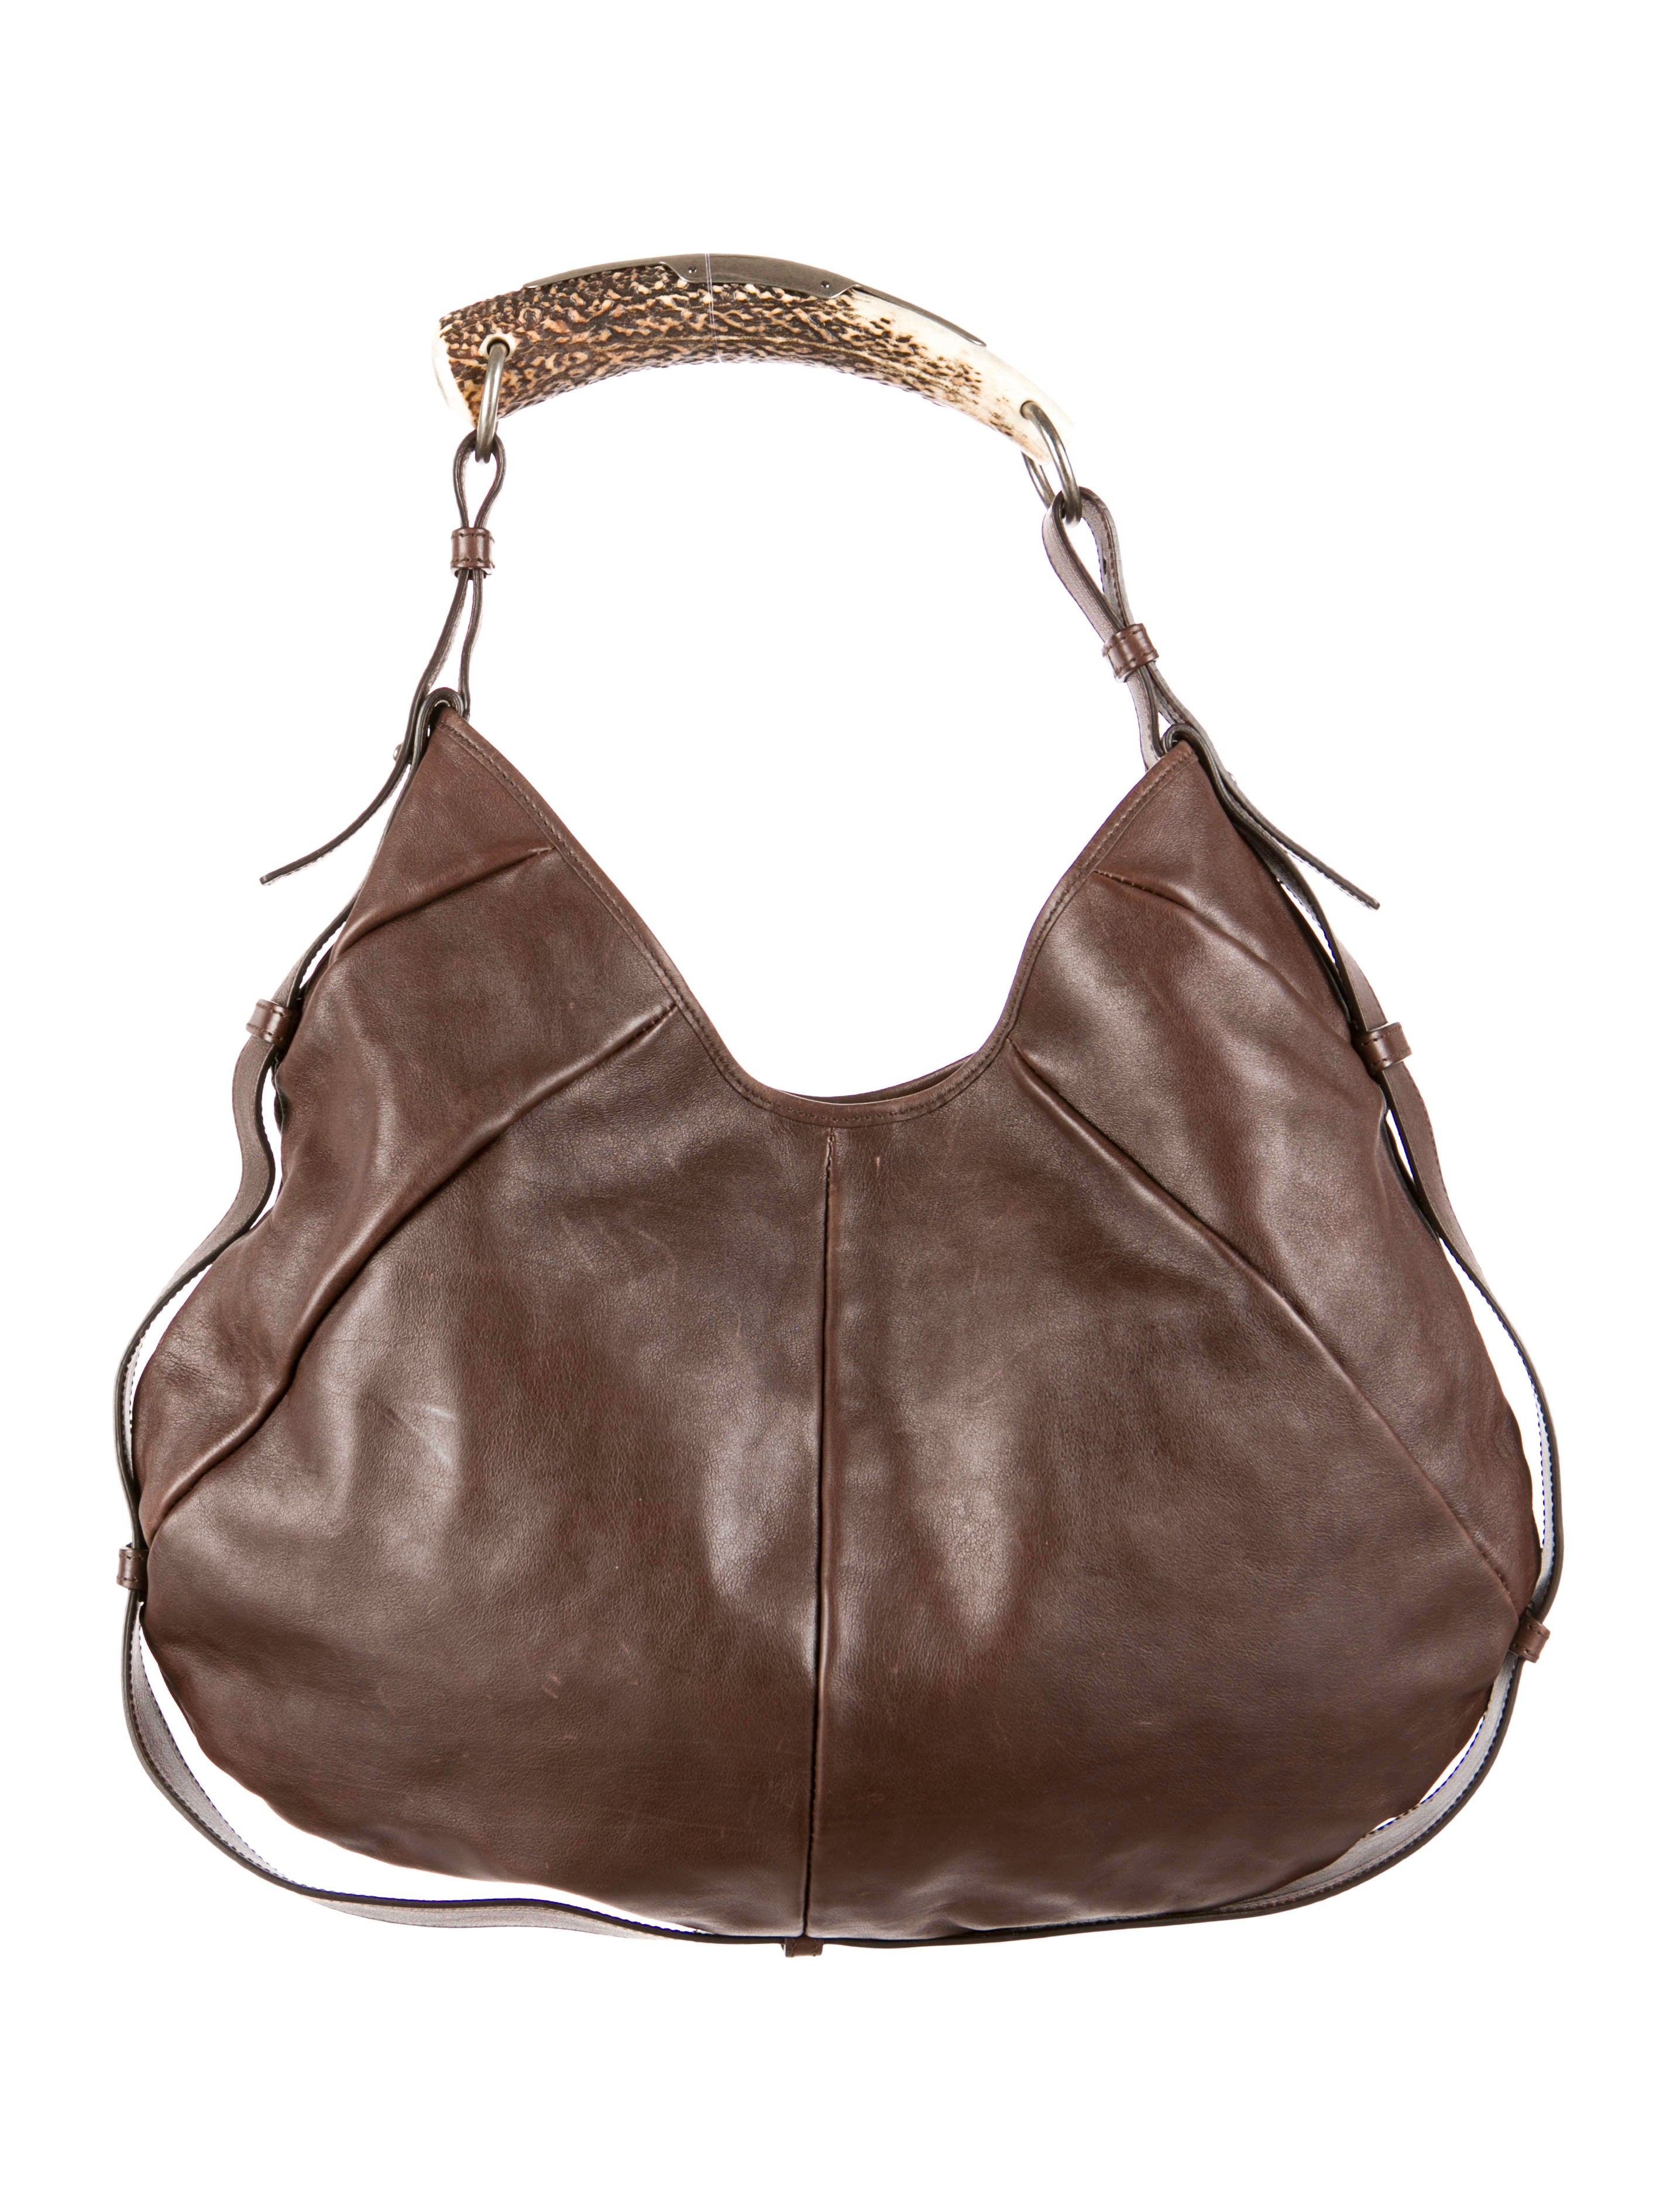 Yves Saint Laurent Mombasa Handle Bag - Handbags - YVE32726 | The ...